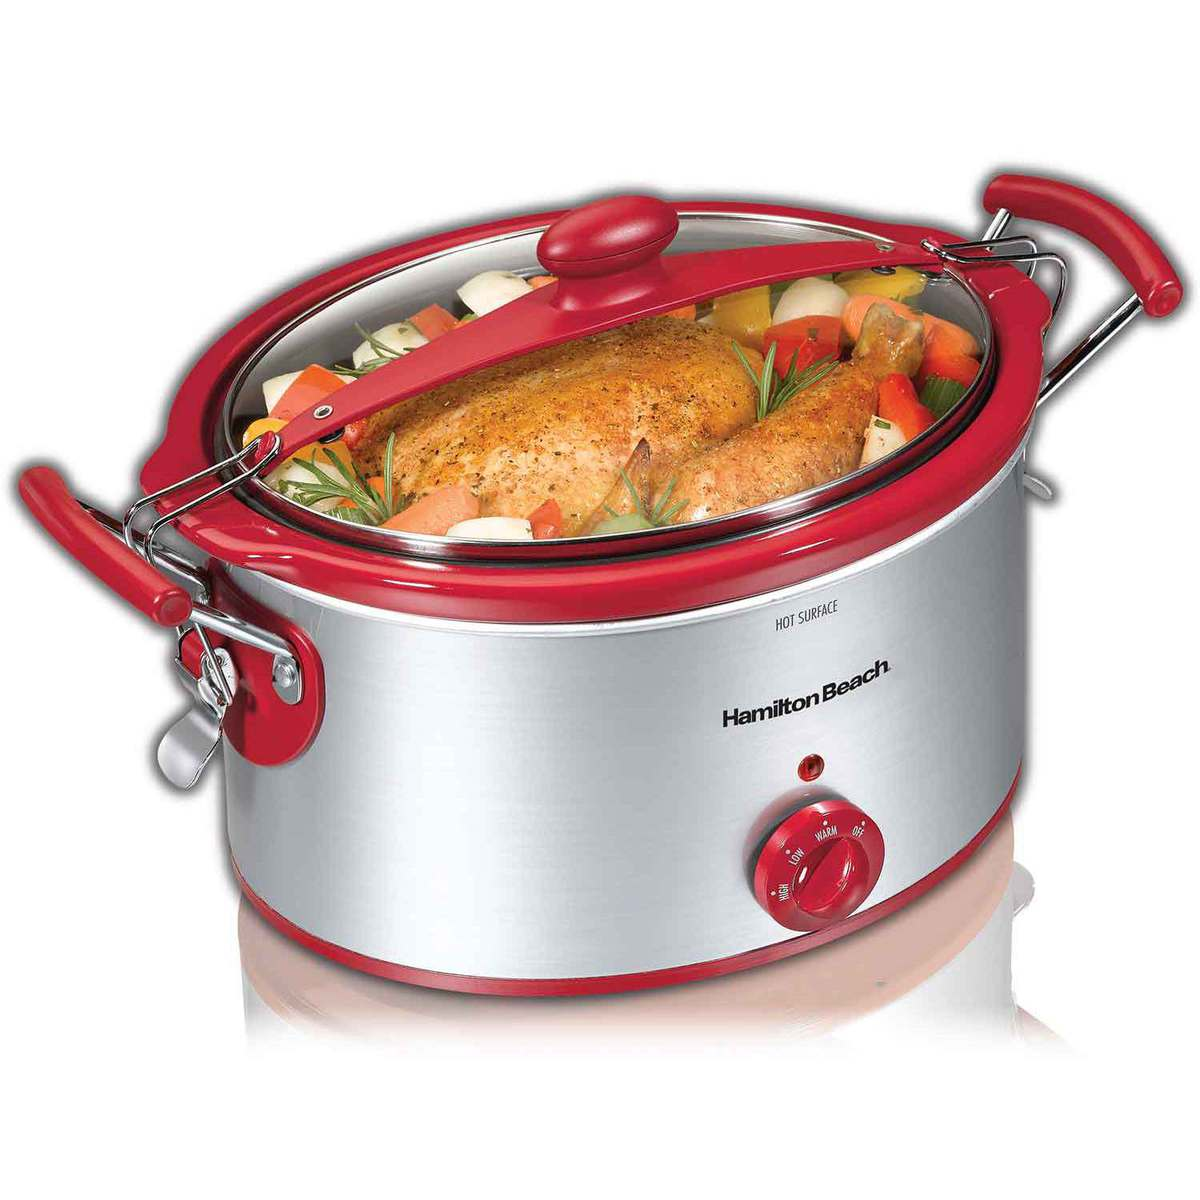 Ensemble™ Stay or Go® 5 Quart Slow Cooker (33254H)